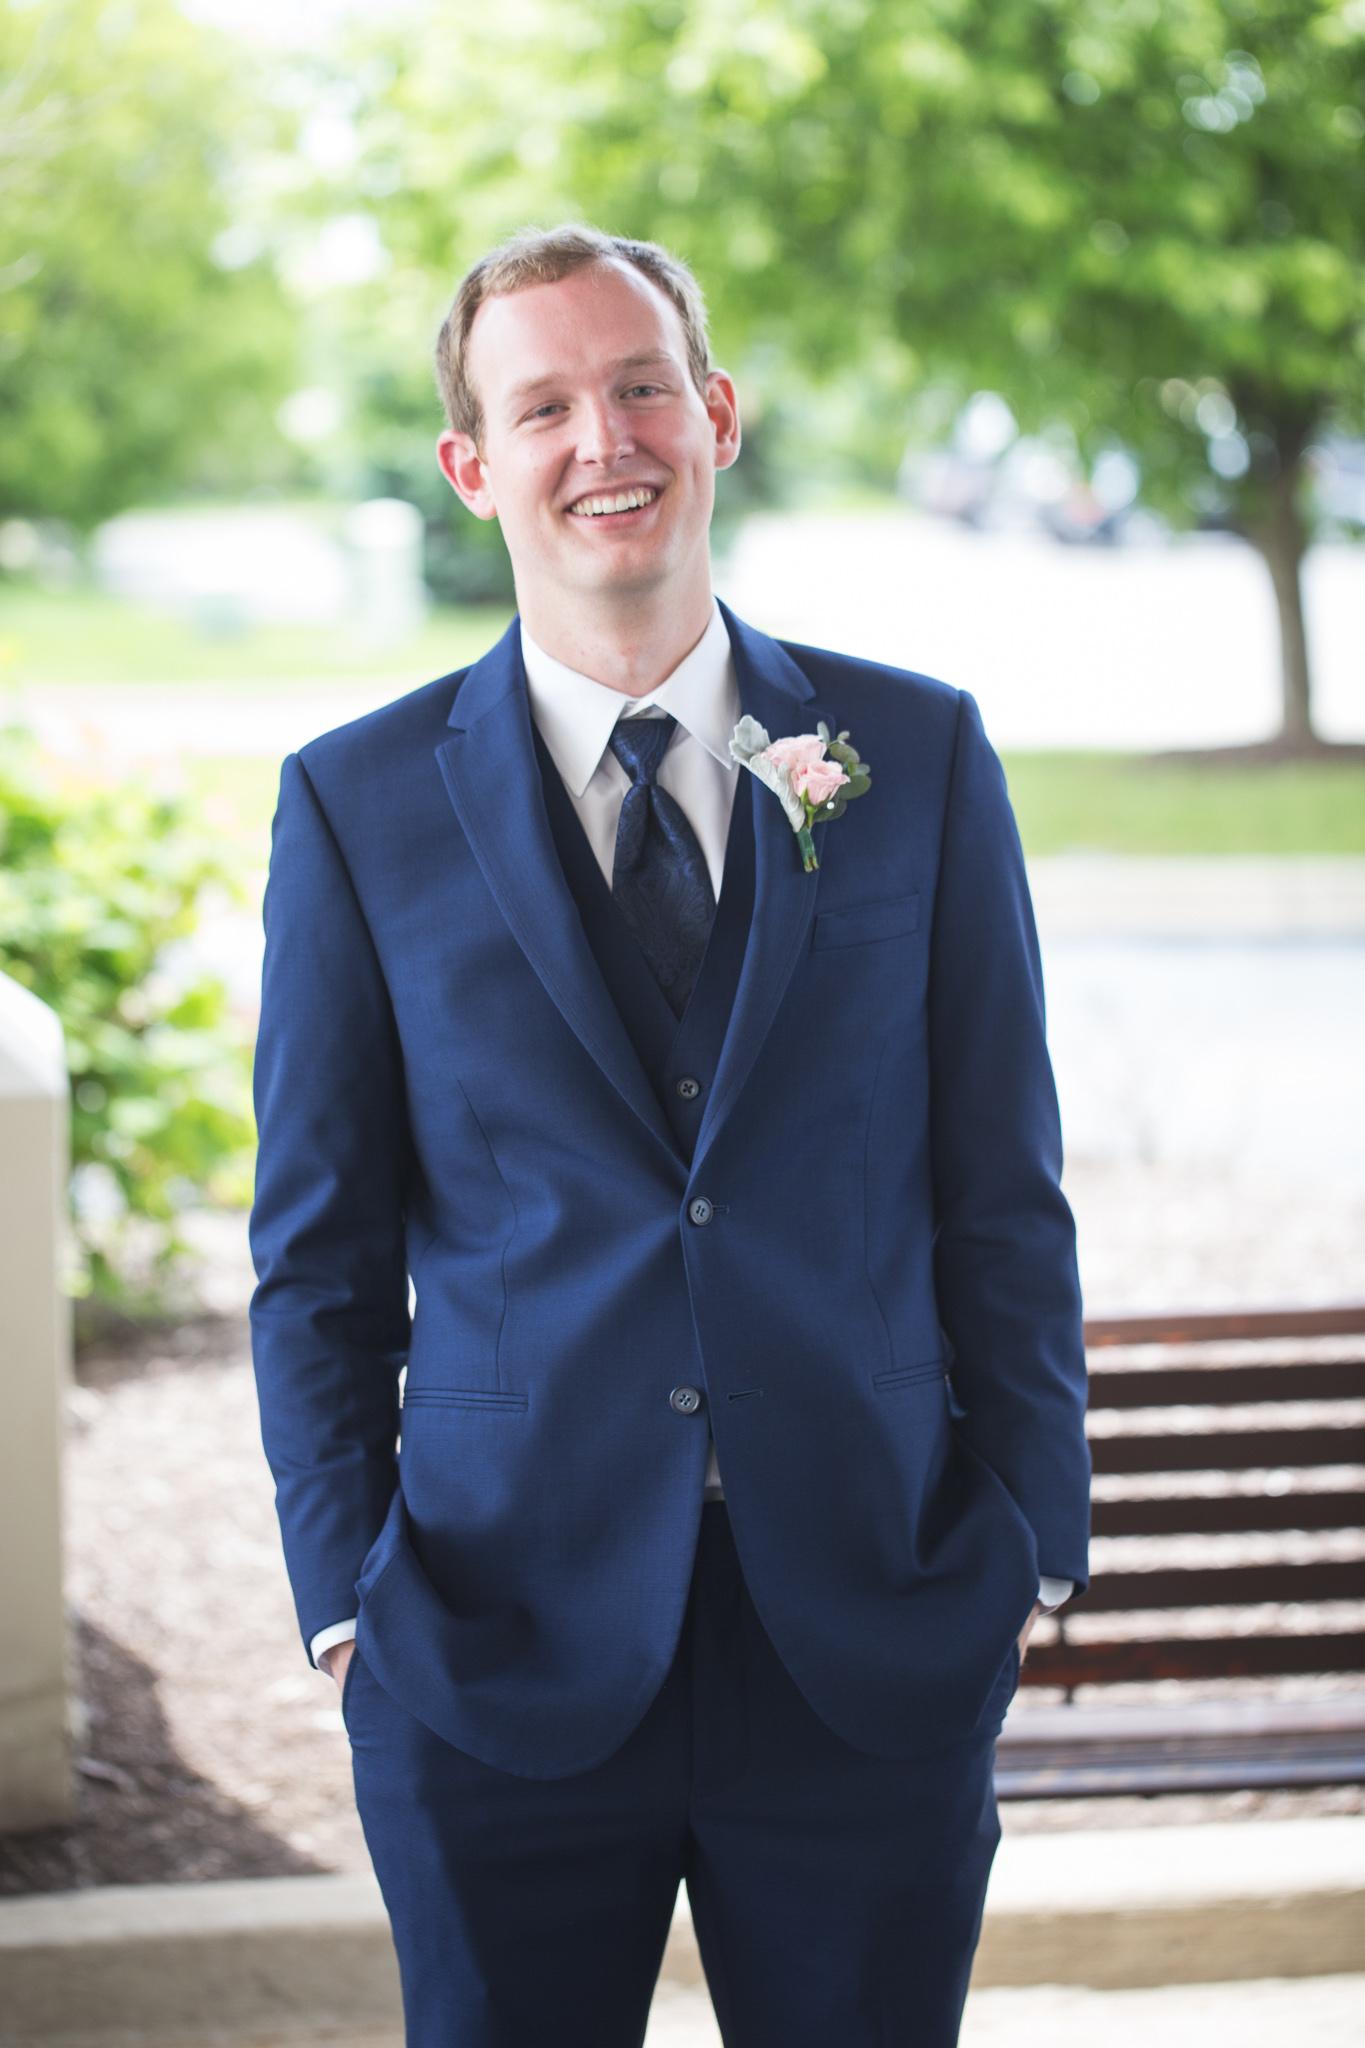 053-best-detroit-michigan-outdoor-wedding-photographer.jpg